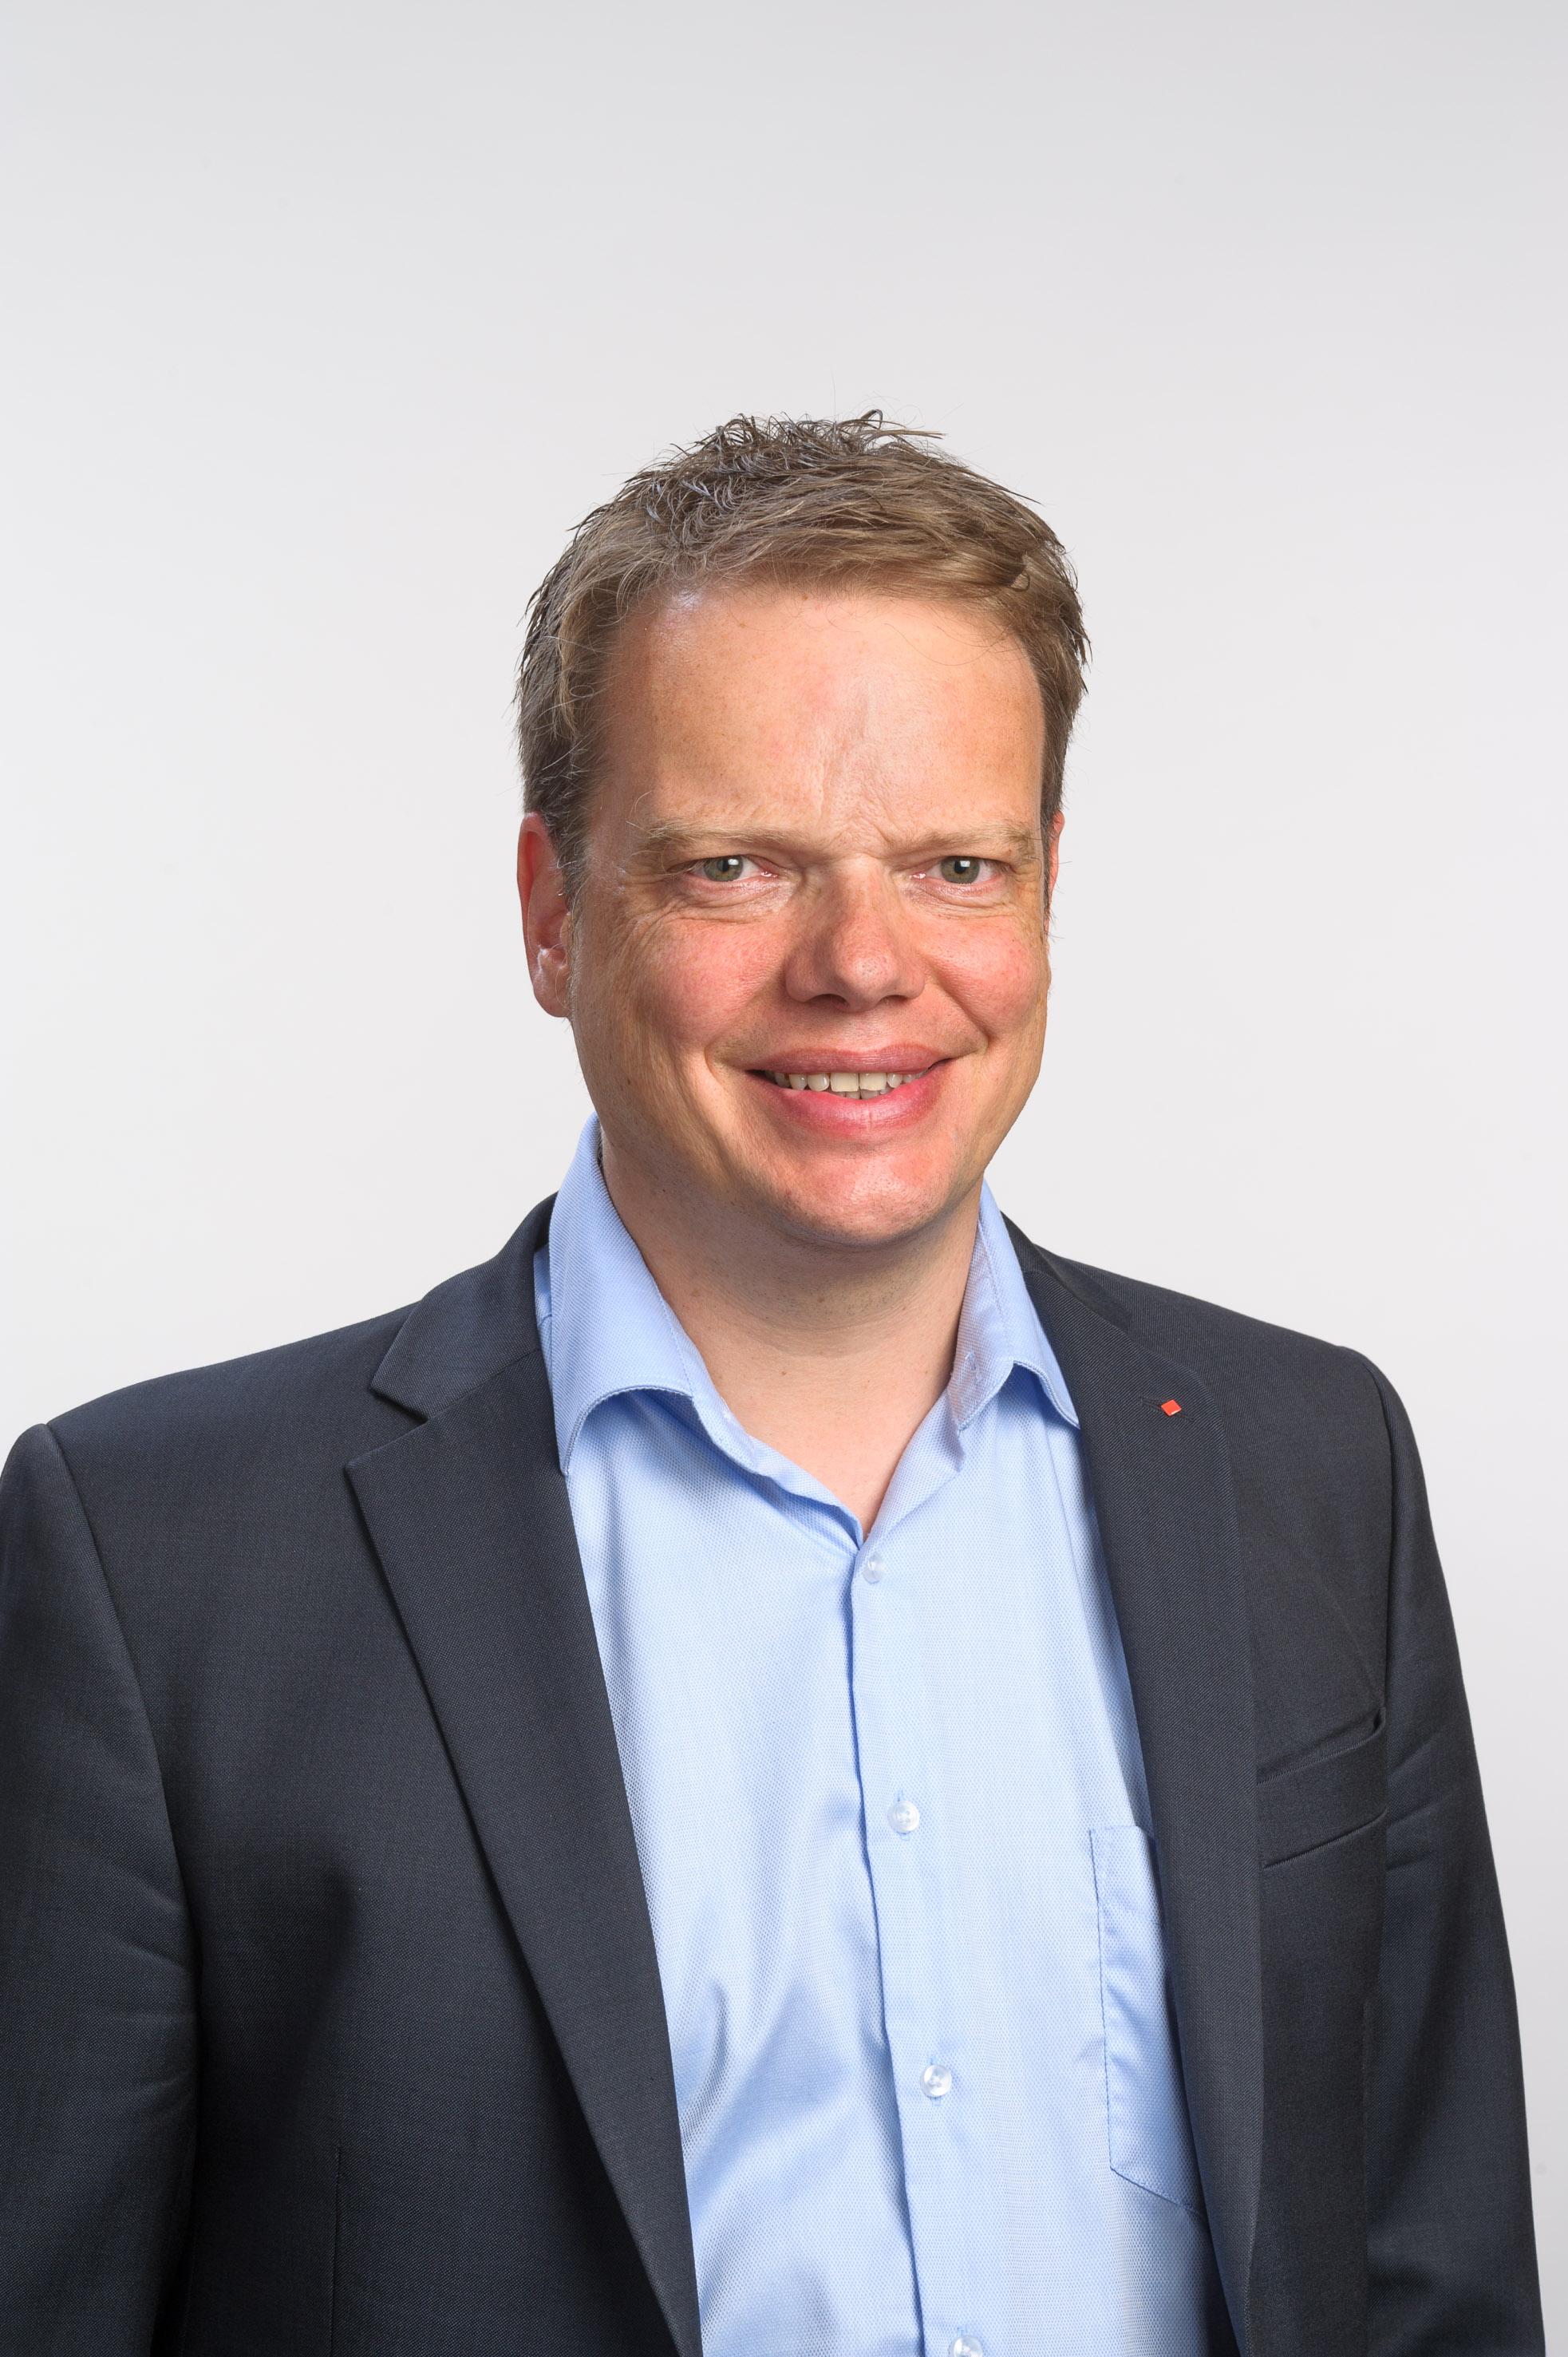 Christoph Bratmann